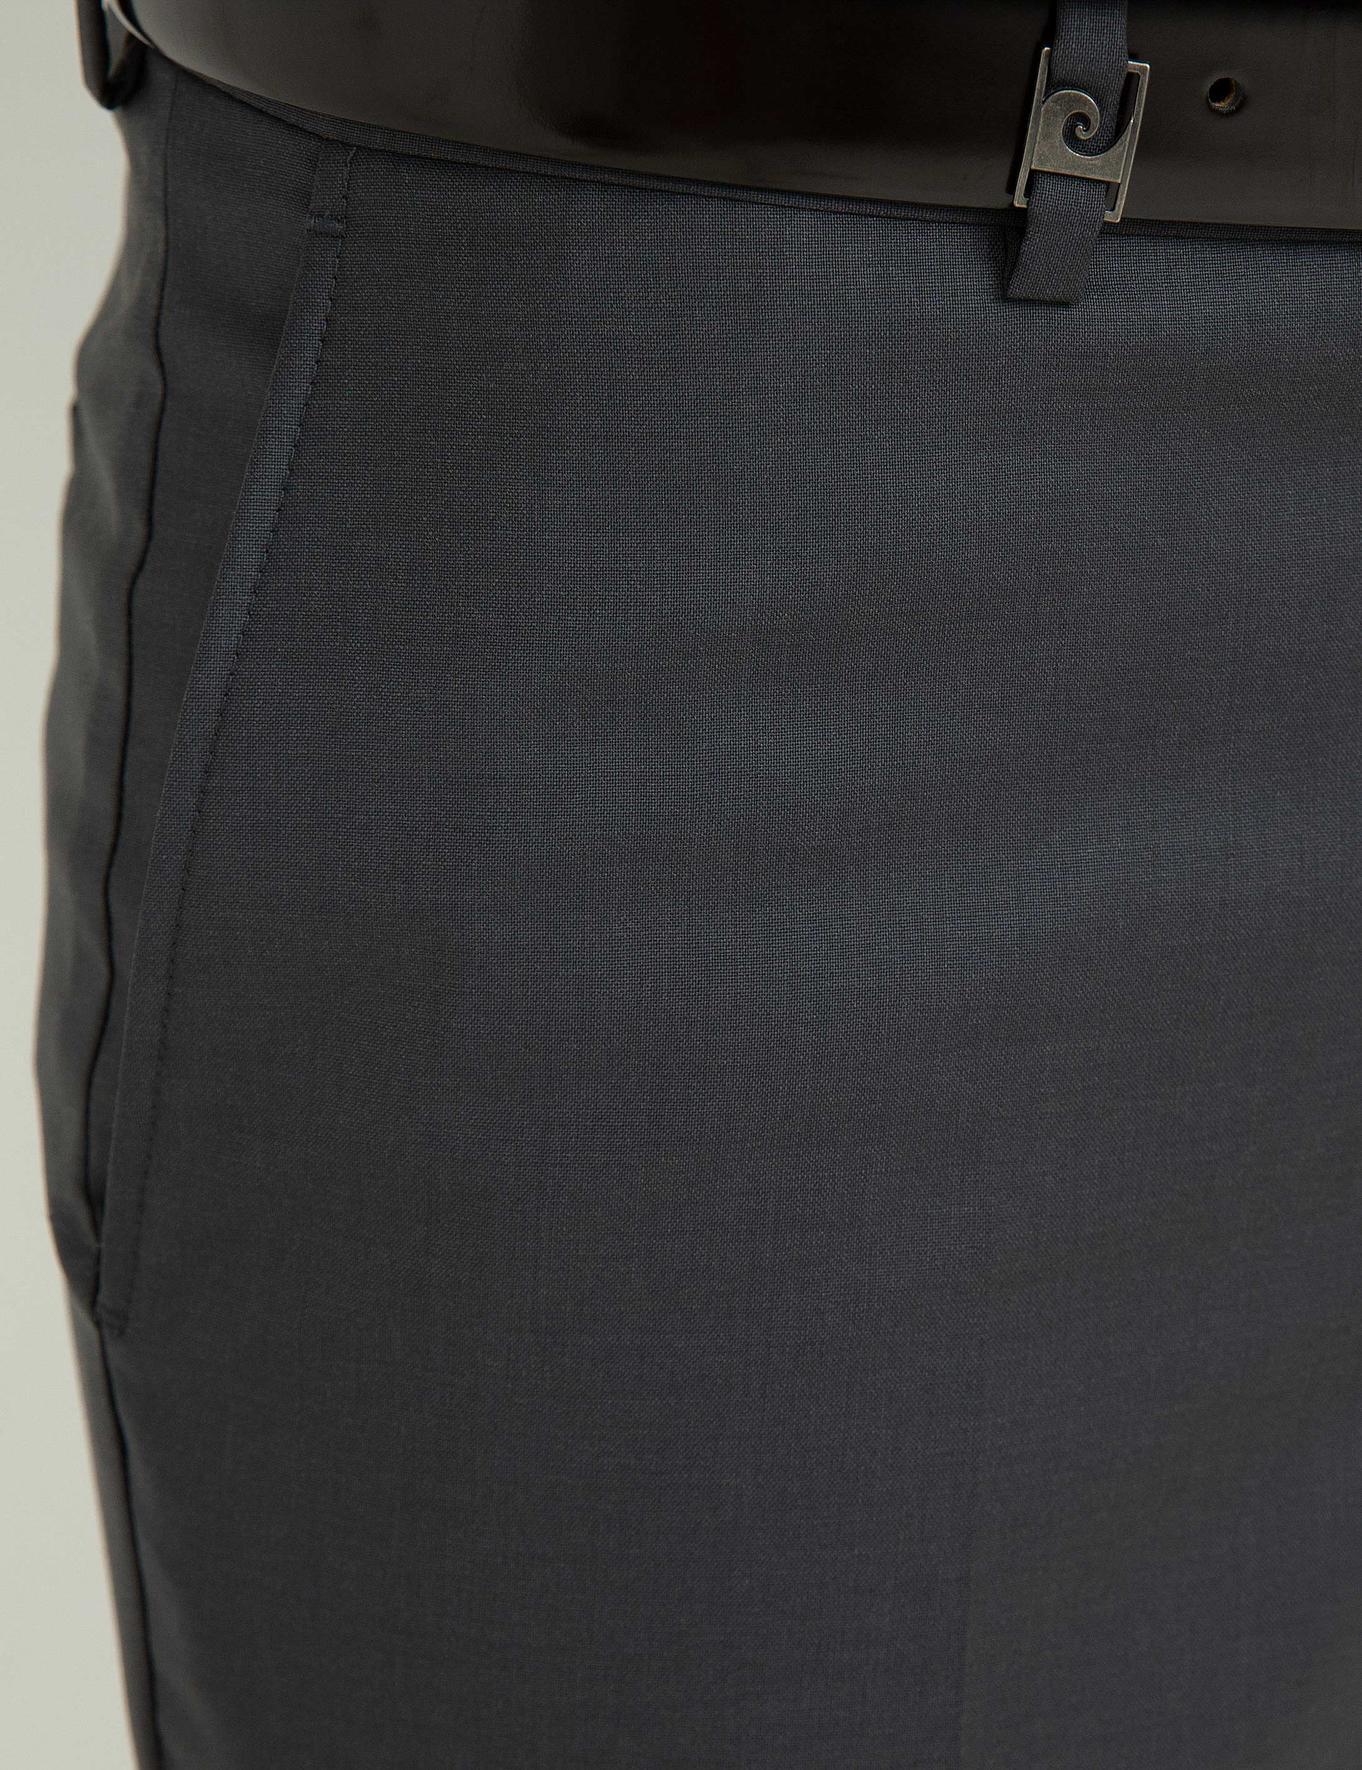 Füme Ekstra Slim Fit Pantolon